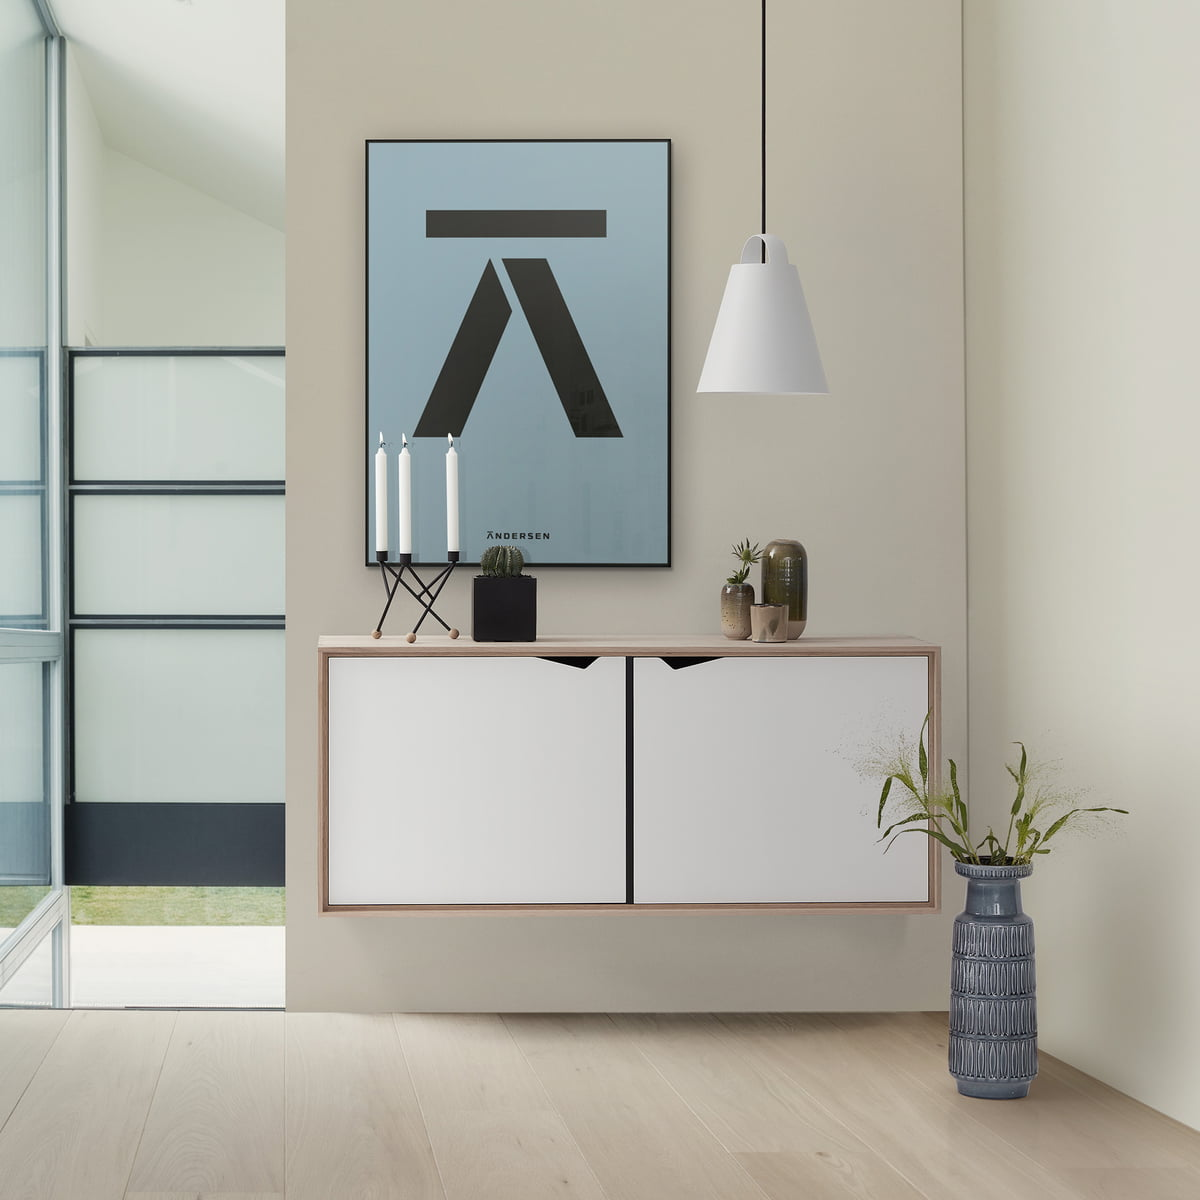 module furniture. Andersen Furniture - S2 Hanging Module With 2 Doors, Soaped Oak / White Laminate